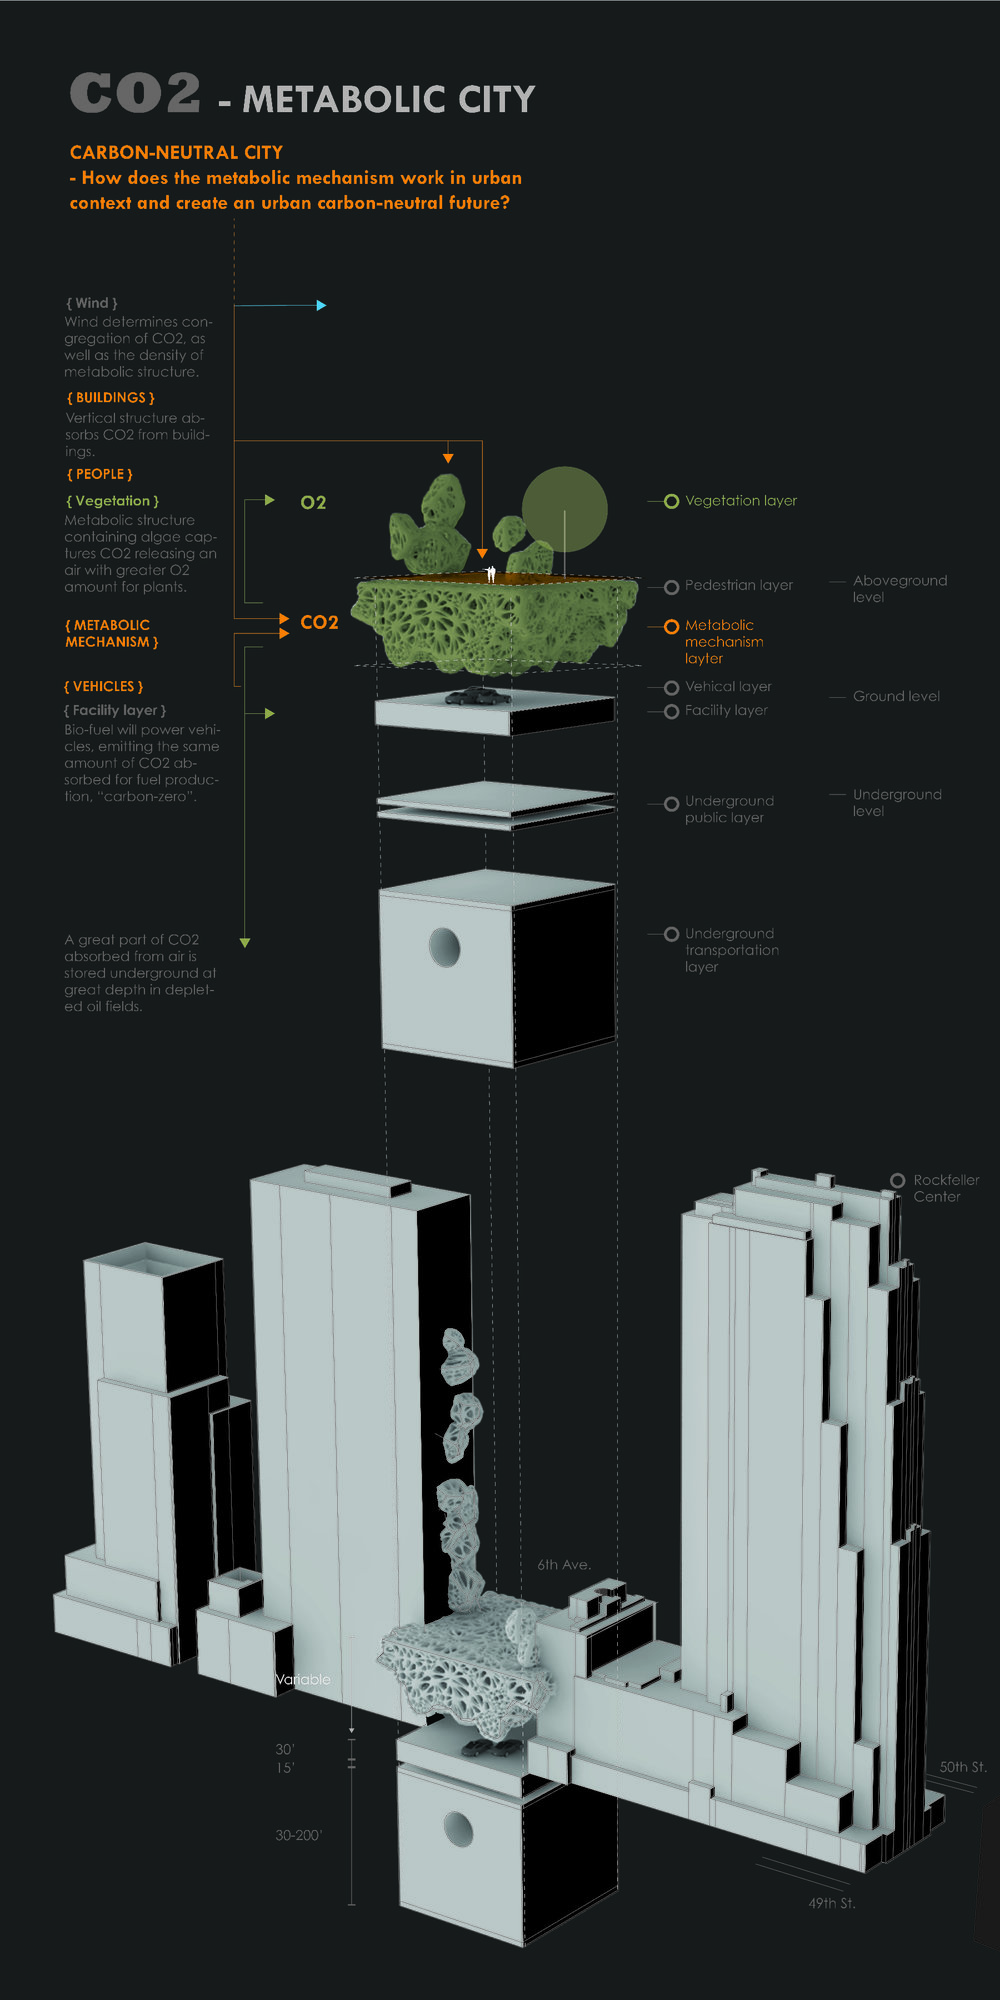 Futuristic carbon-neutral city system